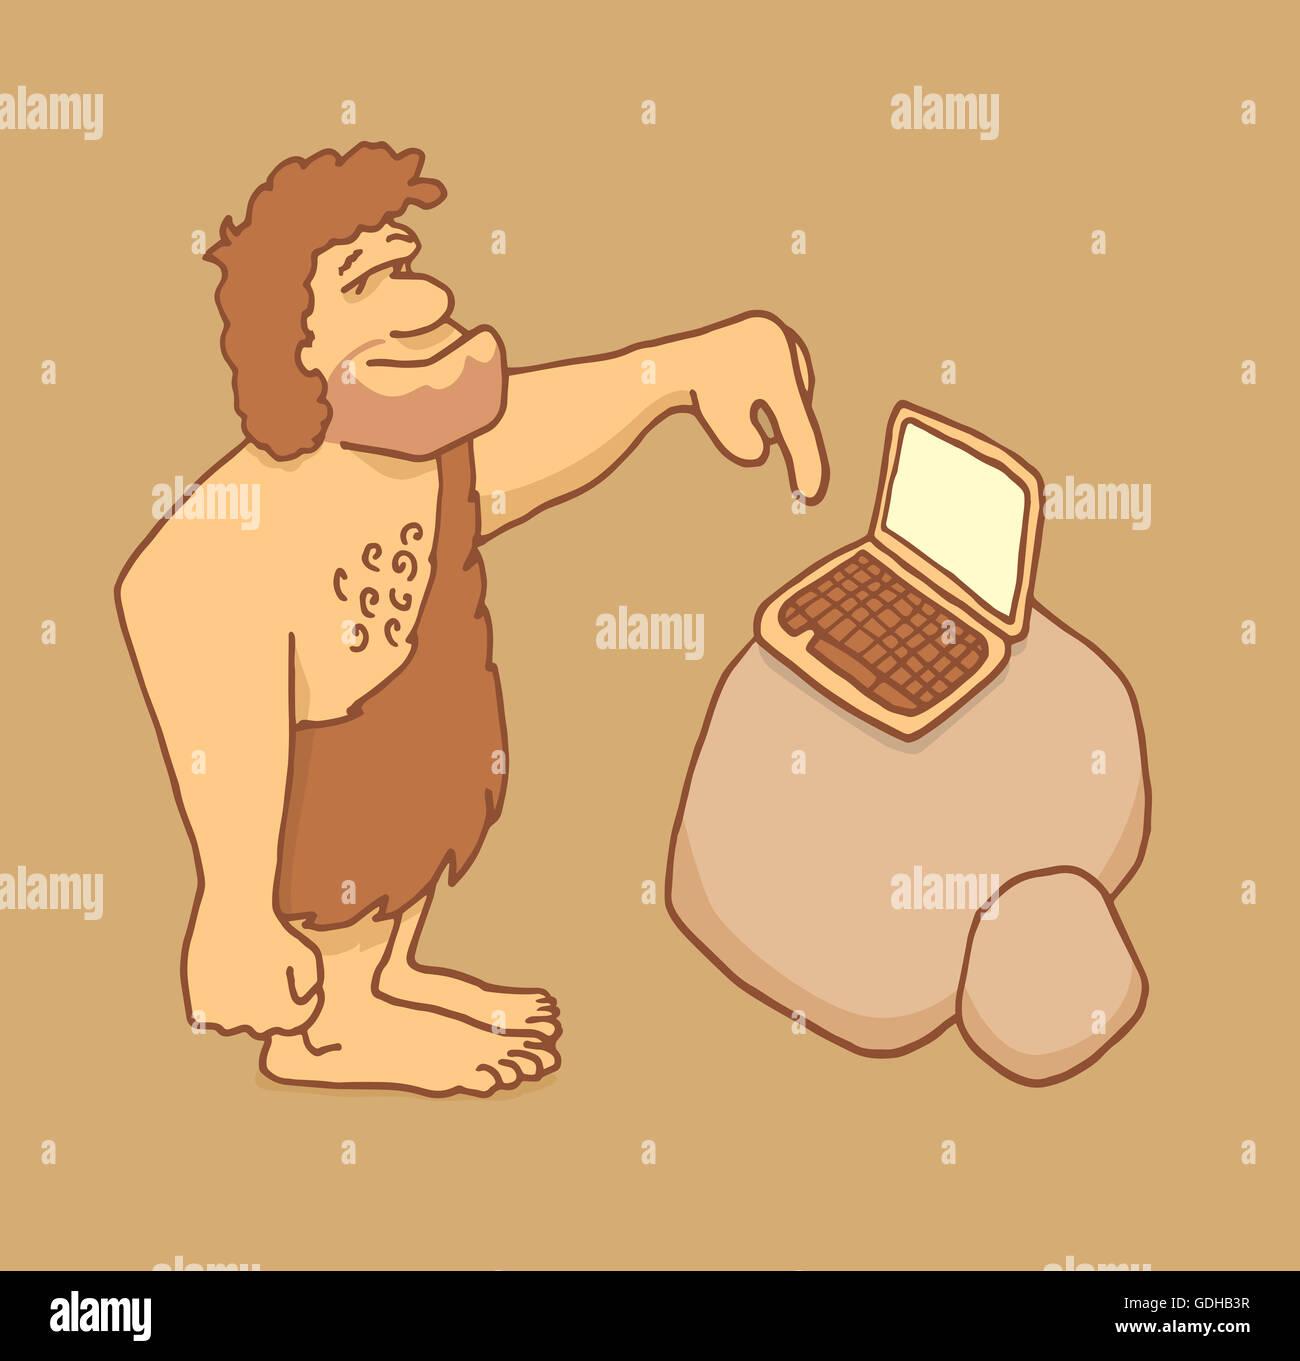 Cartoon illustration of a caveman touching a laptop keyboard - Stock Image